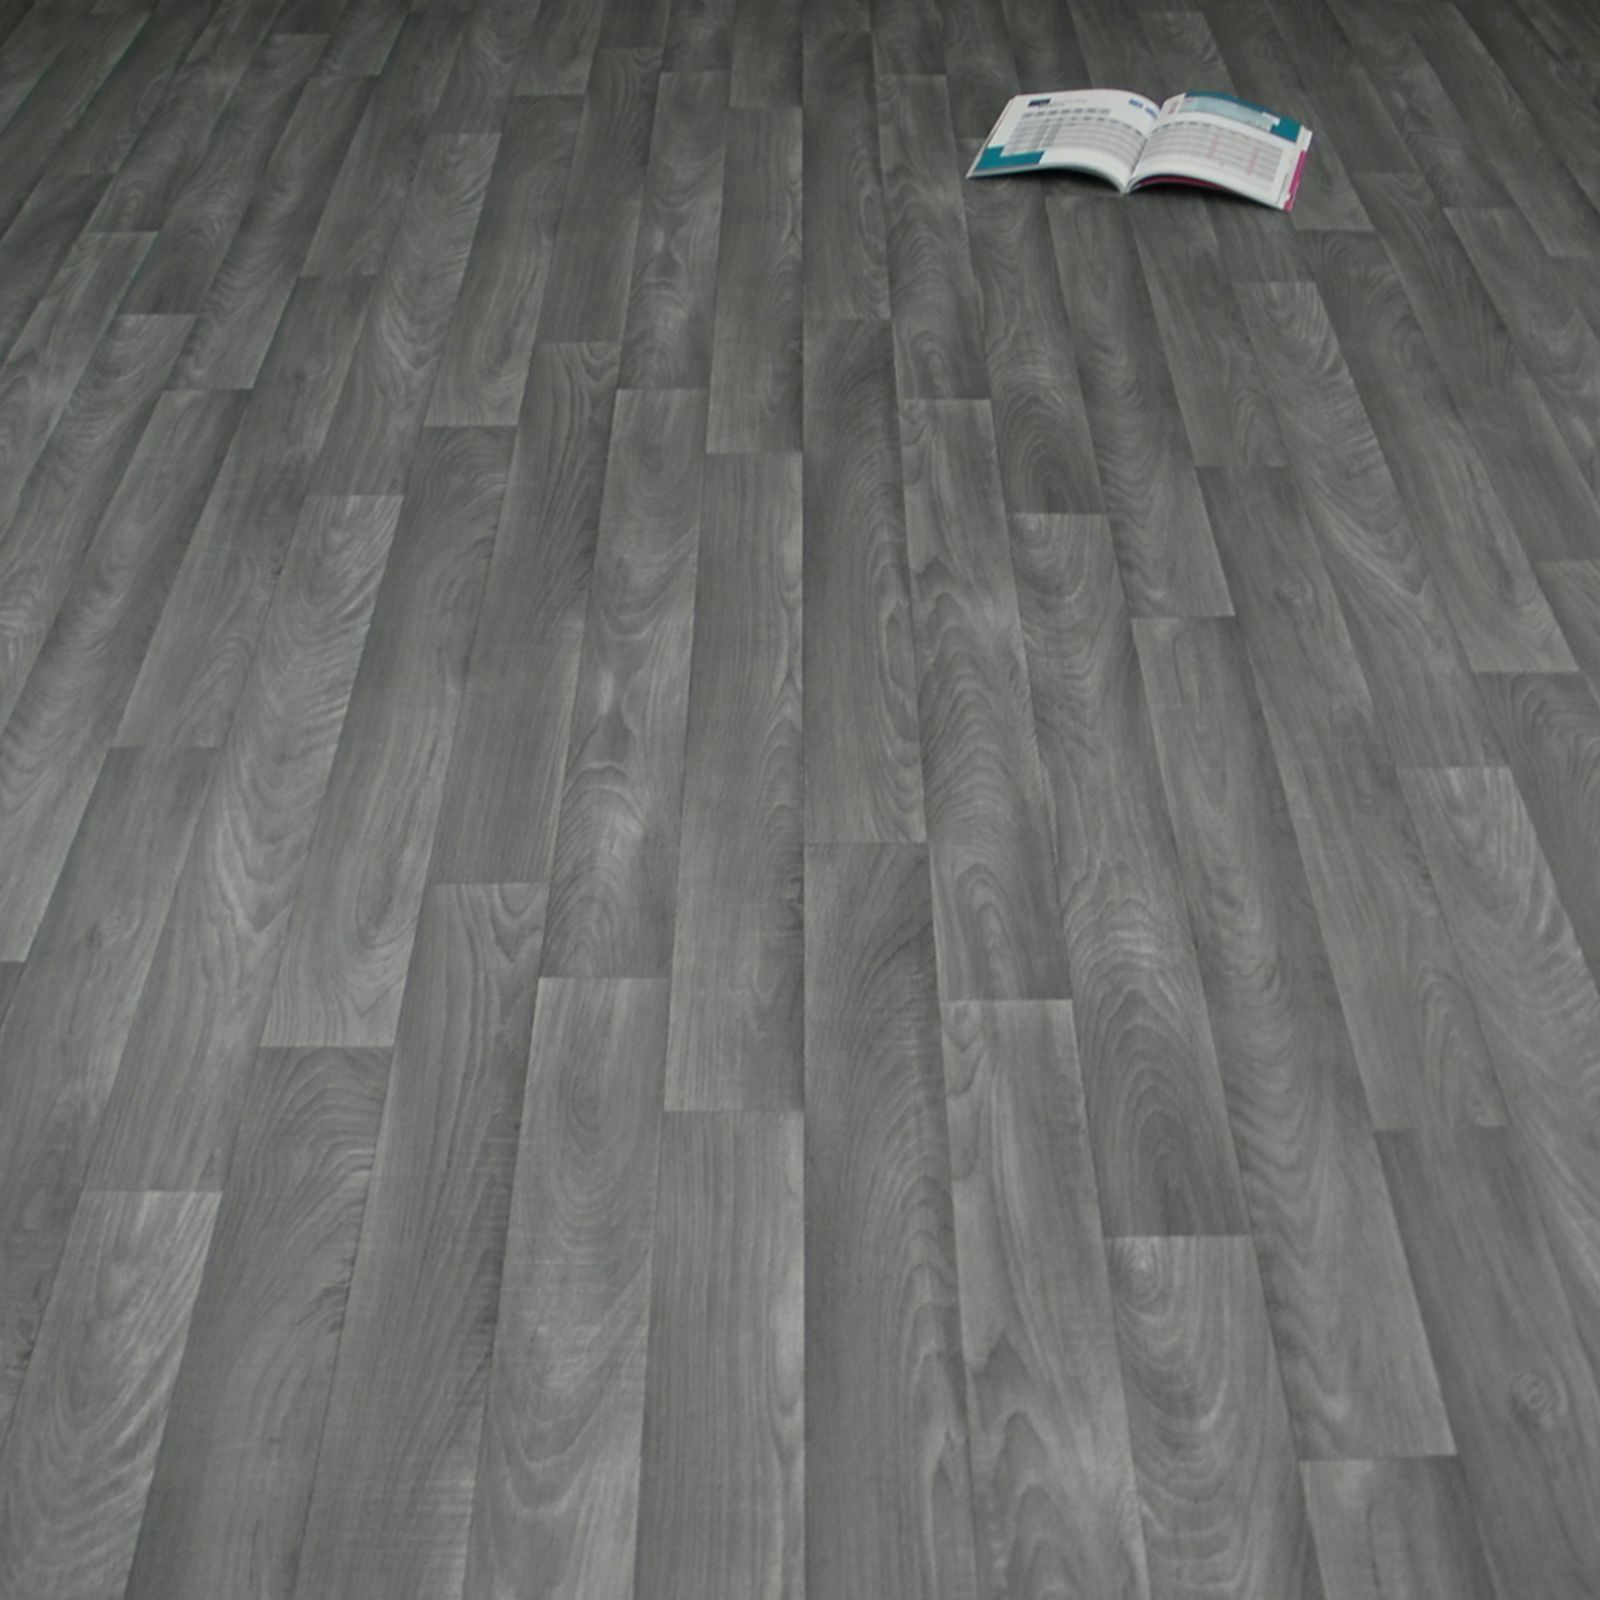 PVC Vinyl Bodenbelag Holz Eiche Grau CV Vinyl Breite 2 m (  m²)